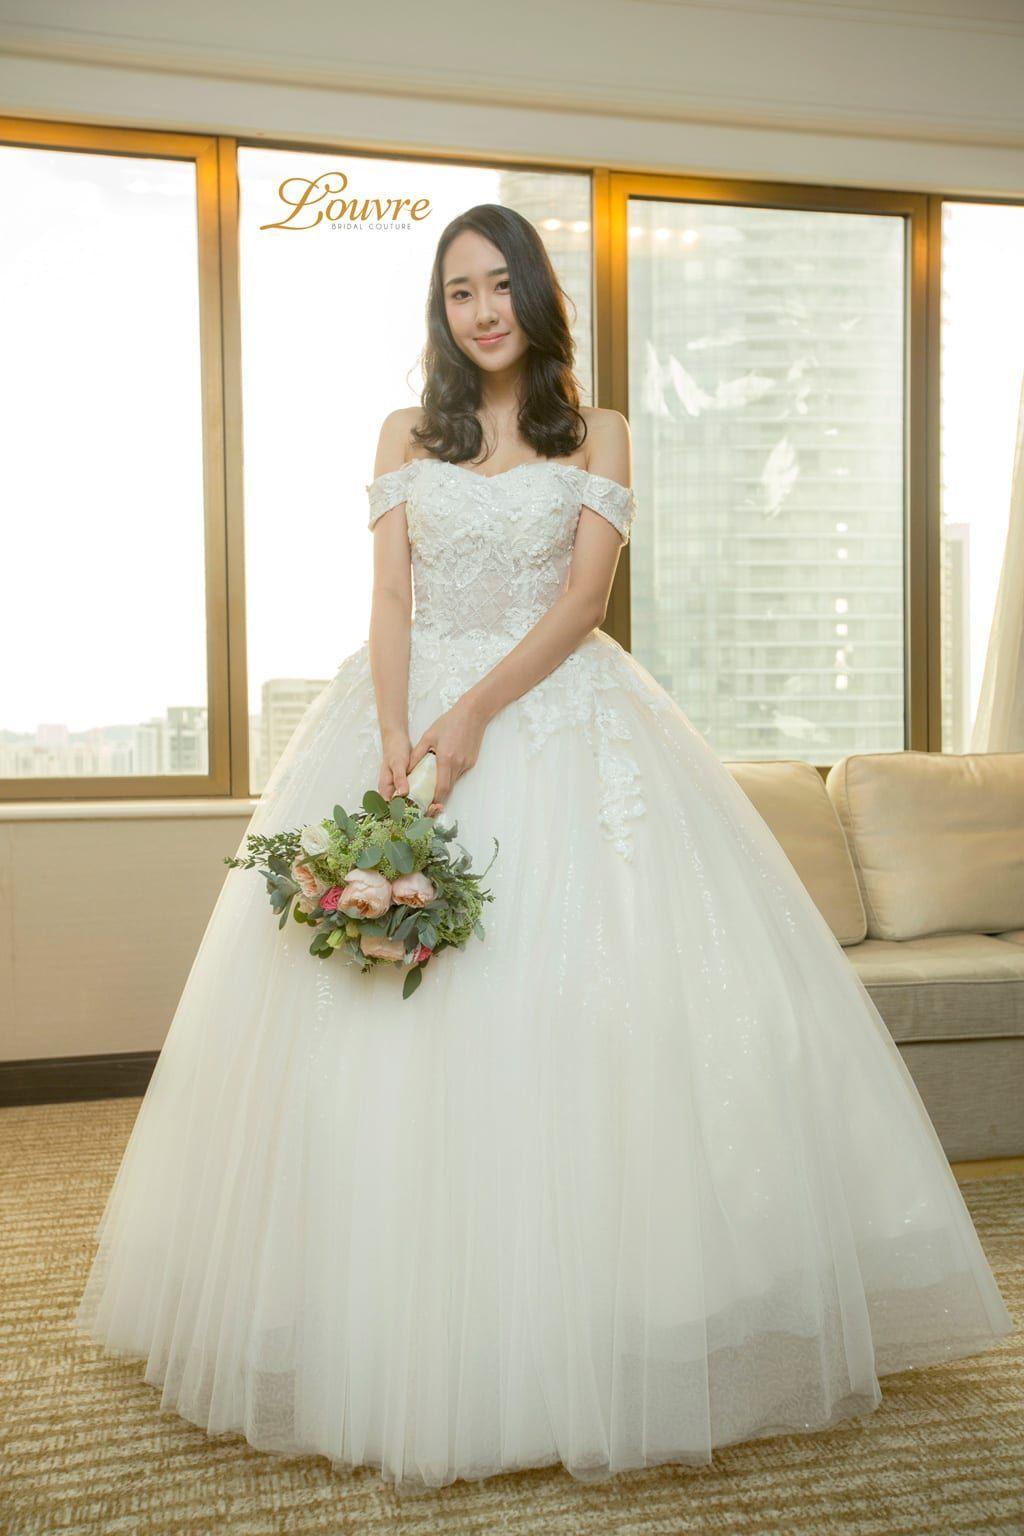 Wedding Gown Shops Near Me in 2020 Wedding gown shop